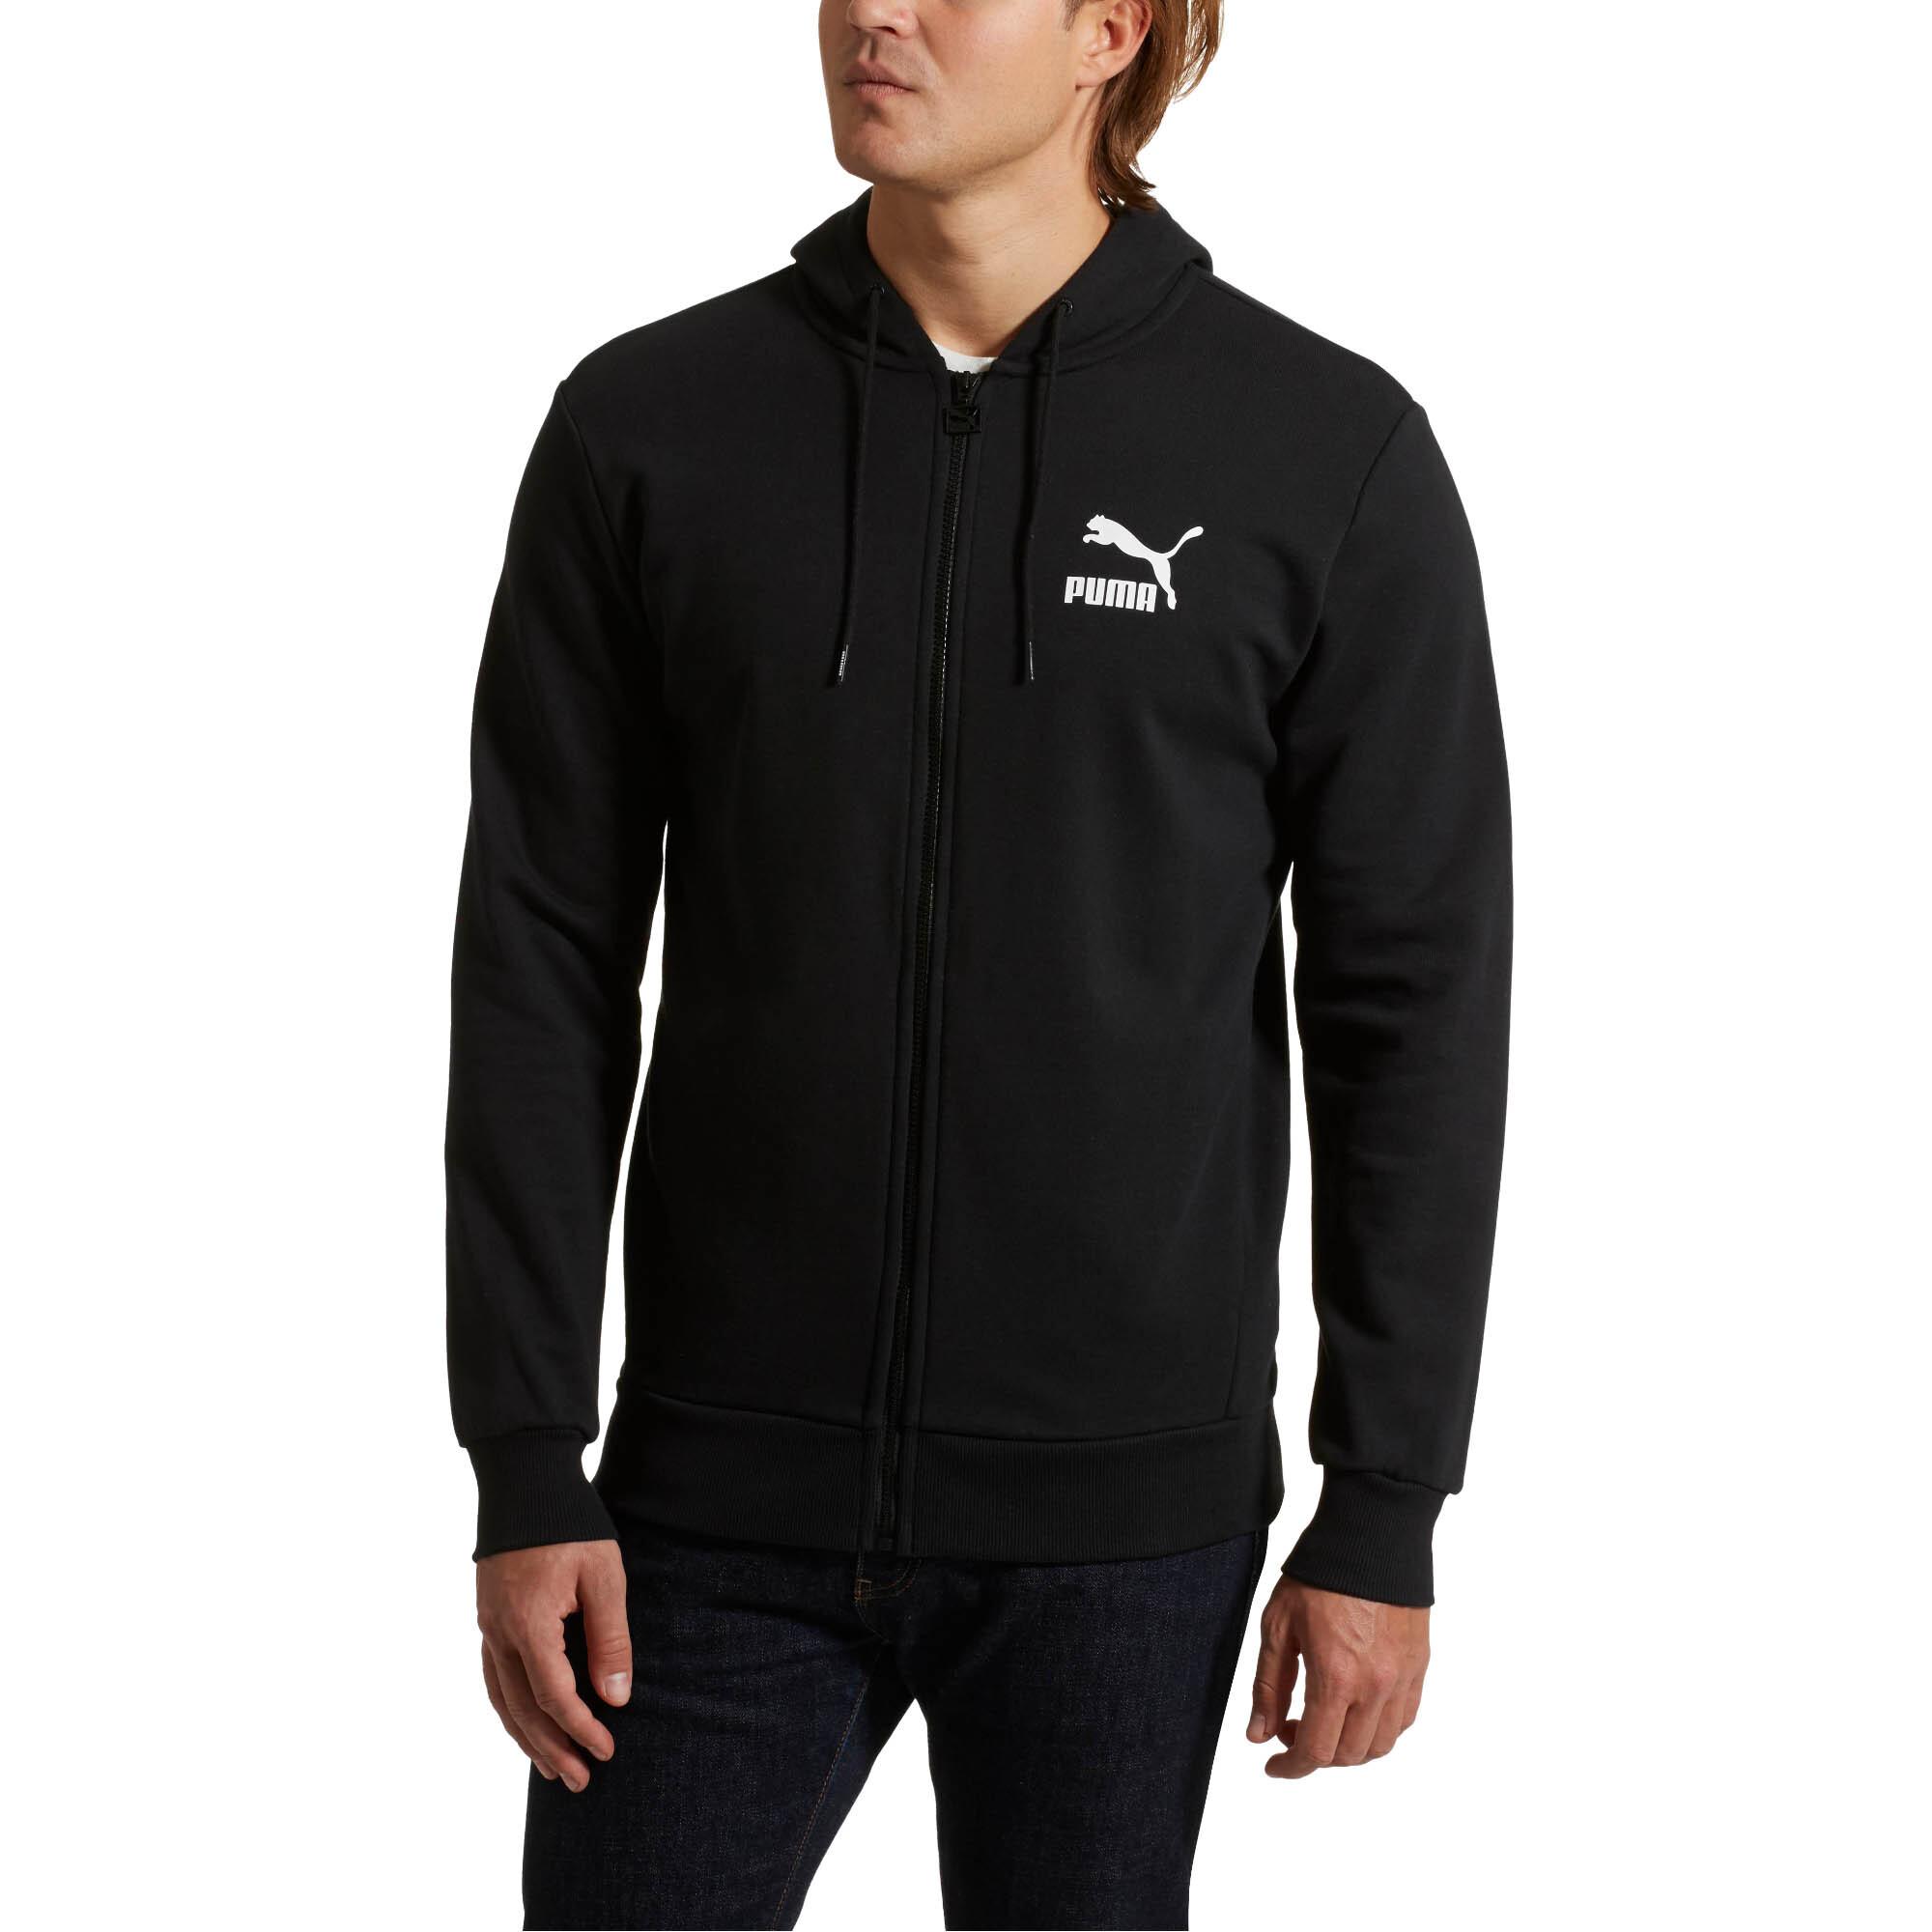 PUMA-Classics-Men-s-Full-Zip-Logo-Hoodie-Men-Sweat-Sport-Classics thumbnail 6